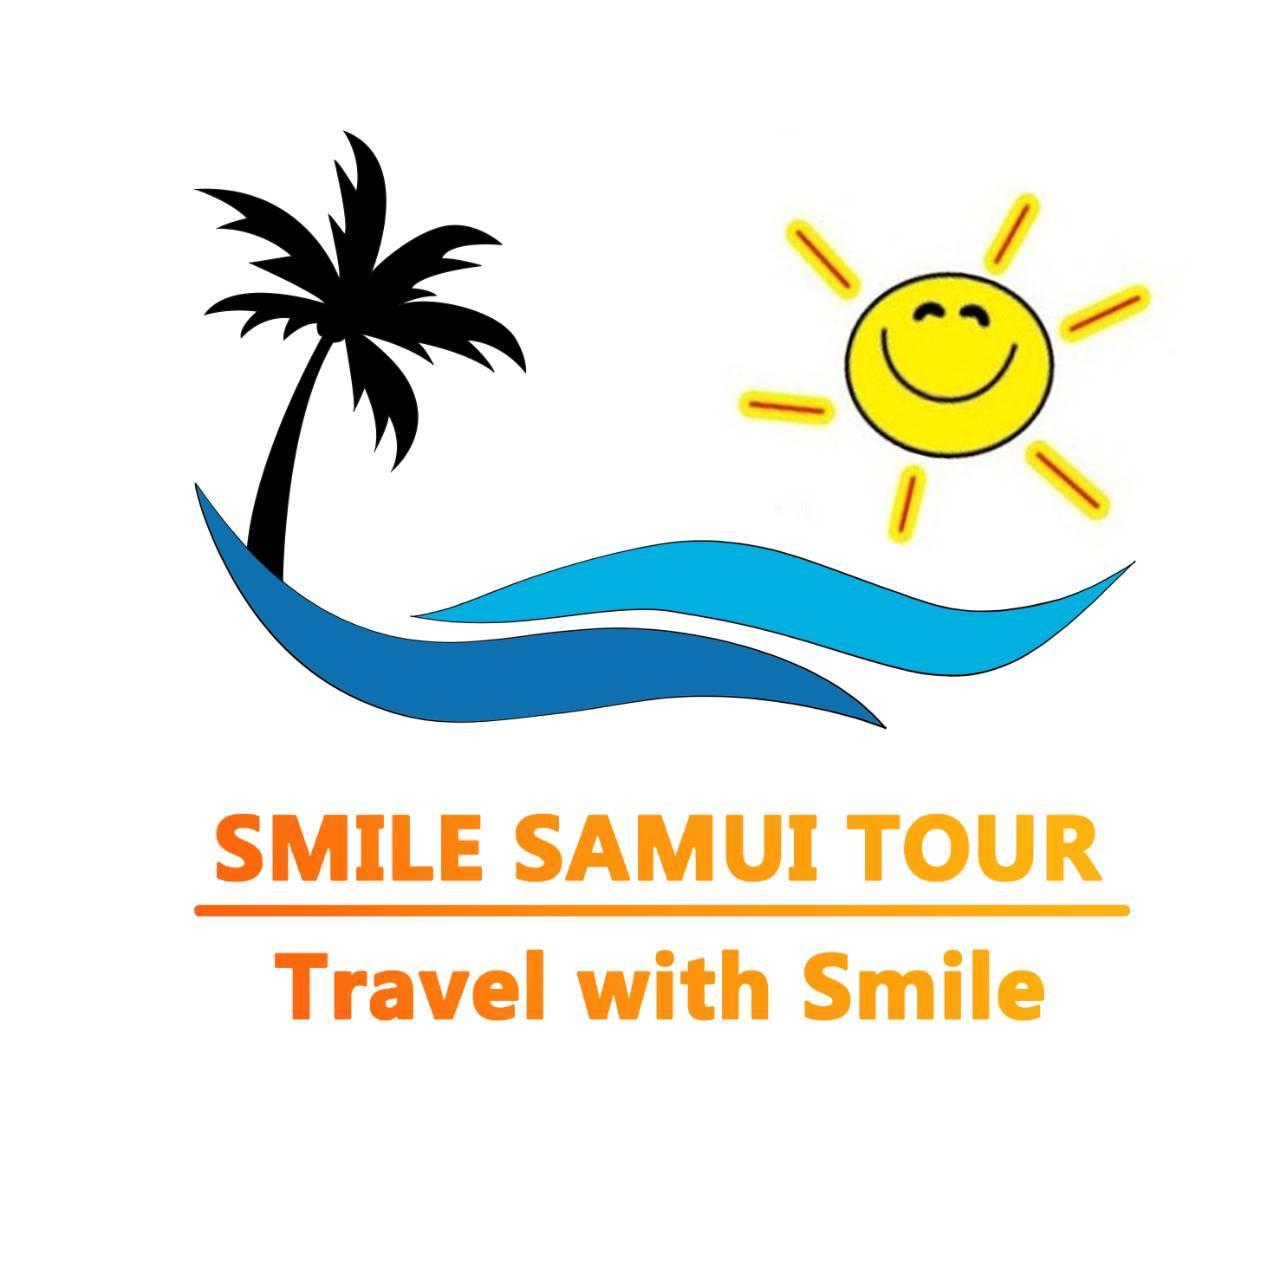 Smile Samui Tour